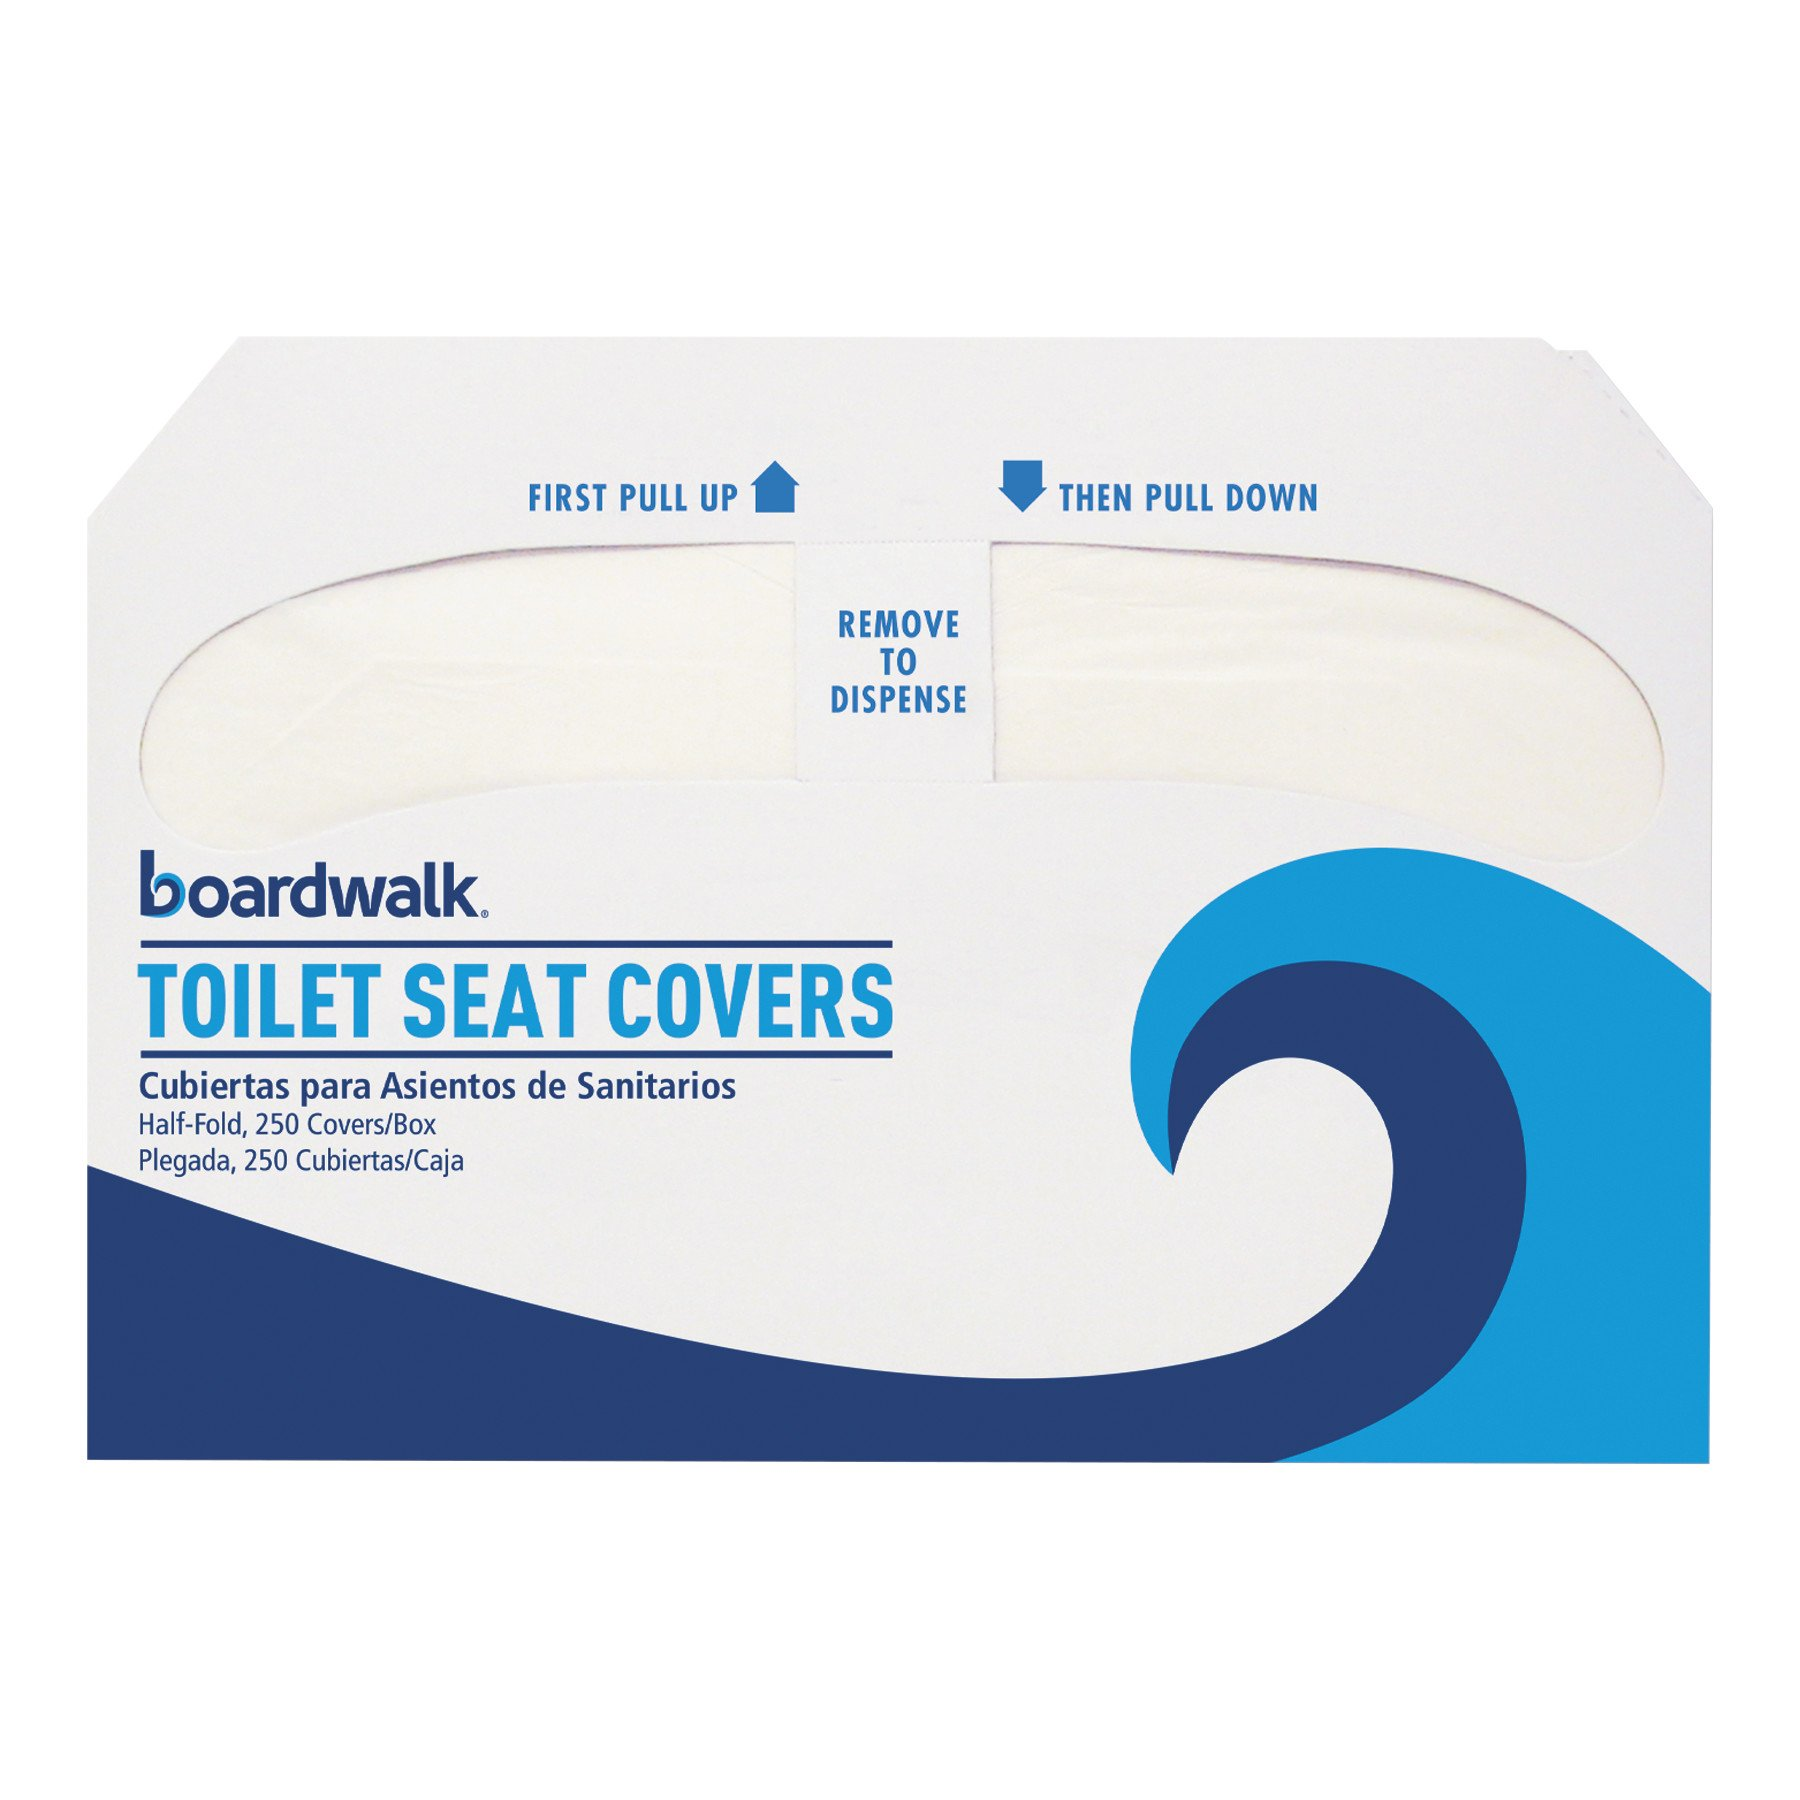 Boardwalk K5000 Premium Half-Fold Toilet Seat Covers, 250 Covers per Sleeve (Case of 20 Sleeves) (3-Pack) by Boardwalk